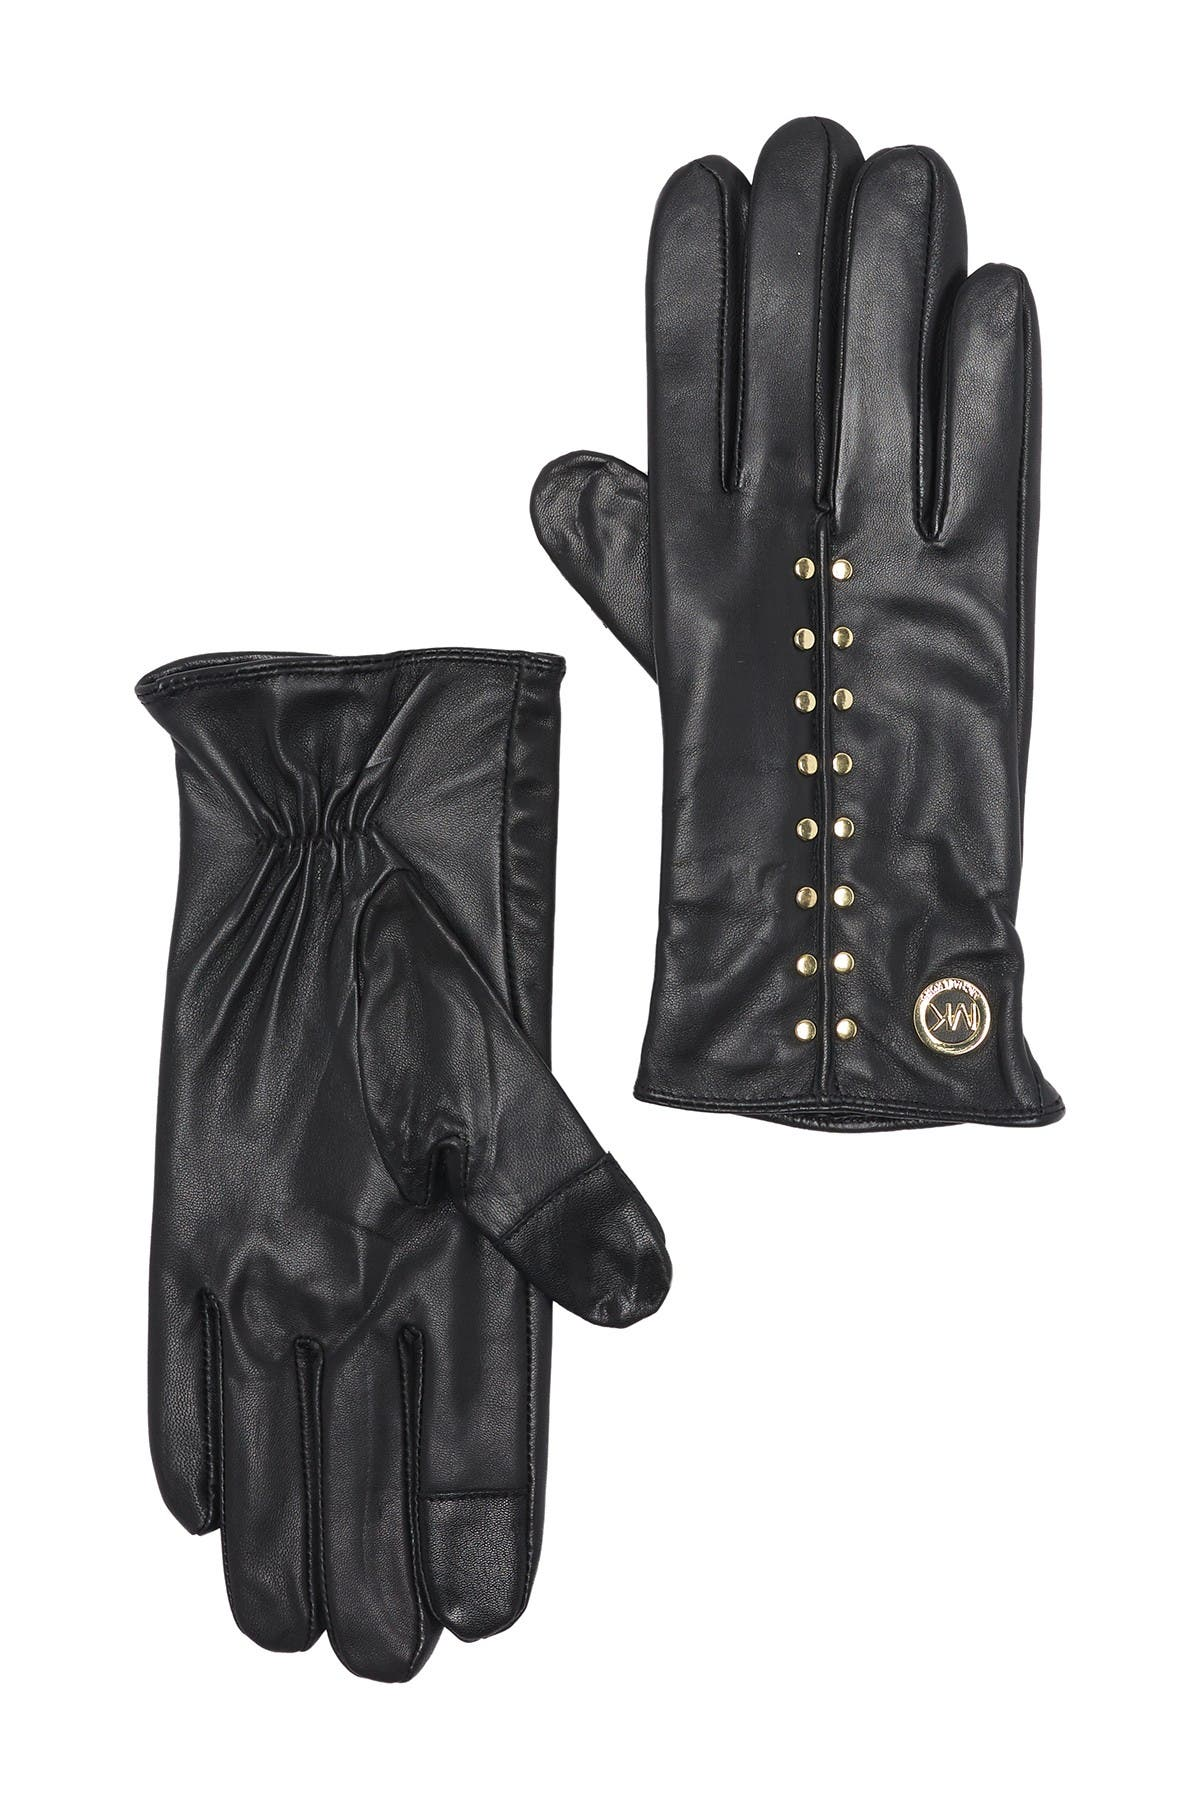 Image of Michael Kors Astor Stud Leather Gloves